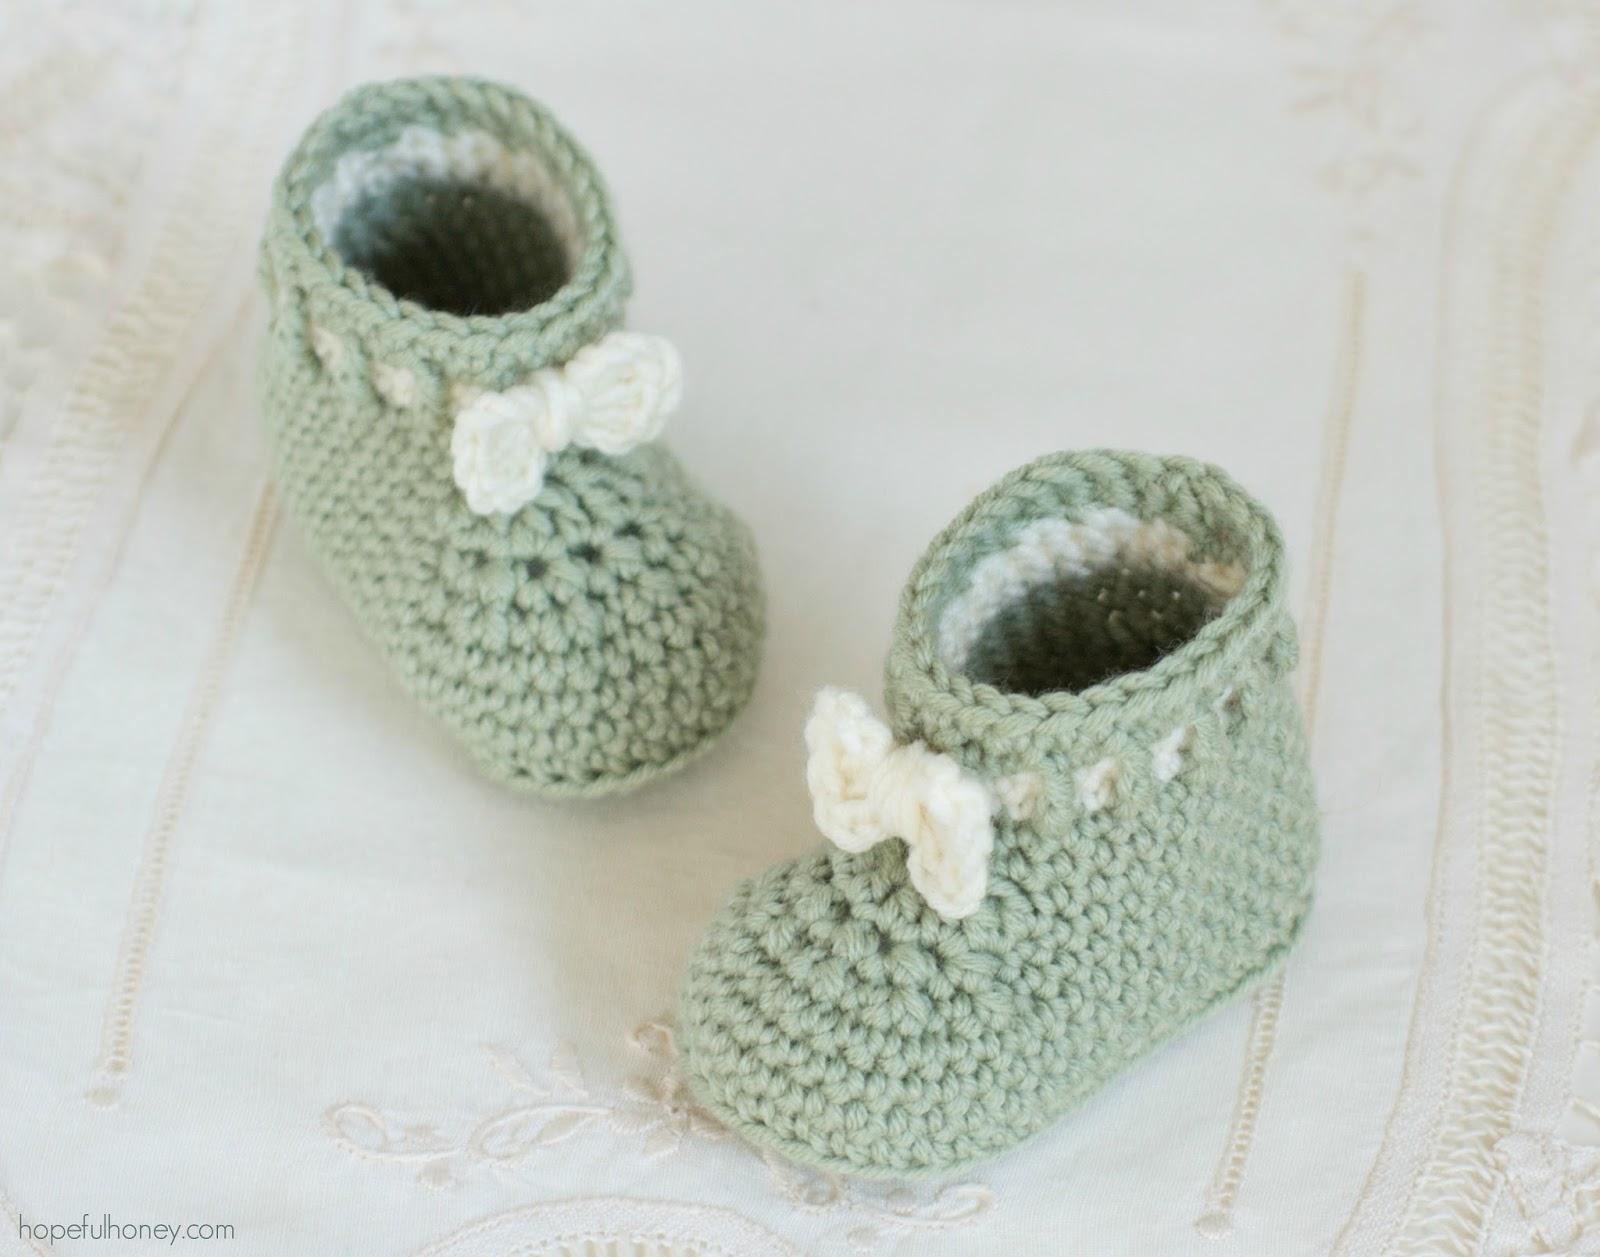 Baby Booties Crochet Pattern Dk Wool : Hopeful Honey Craft, Crochet, Create: Mint Macaroon Baby ...